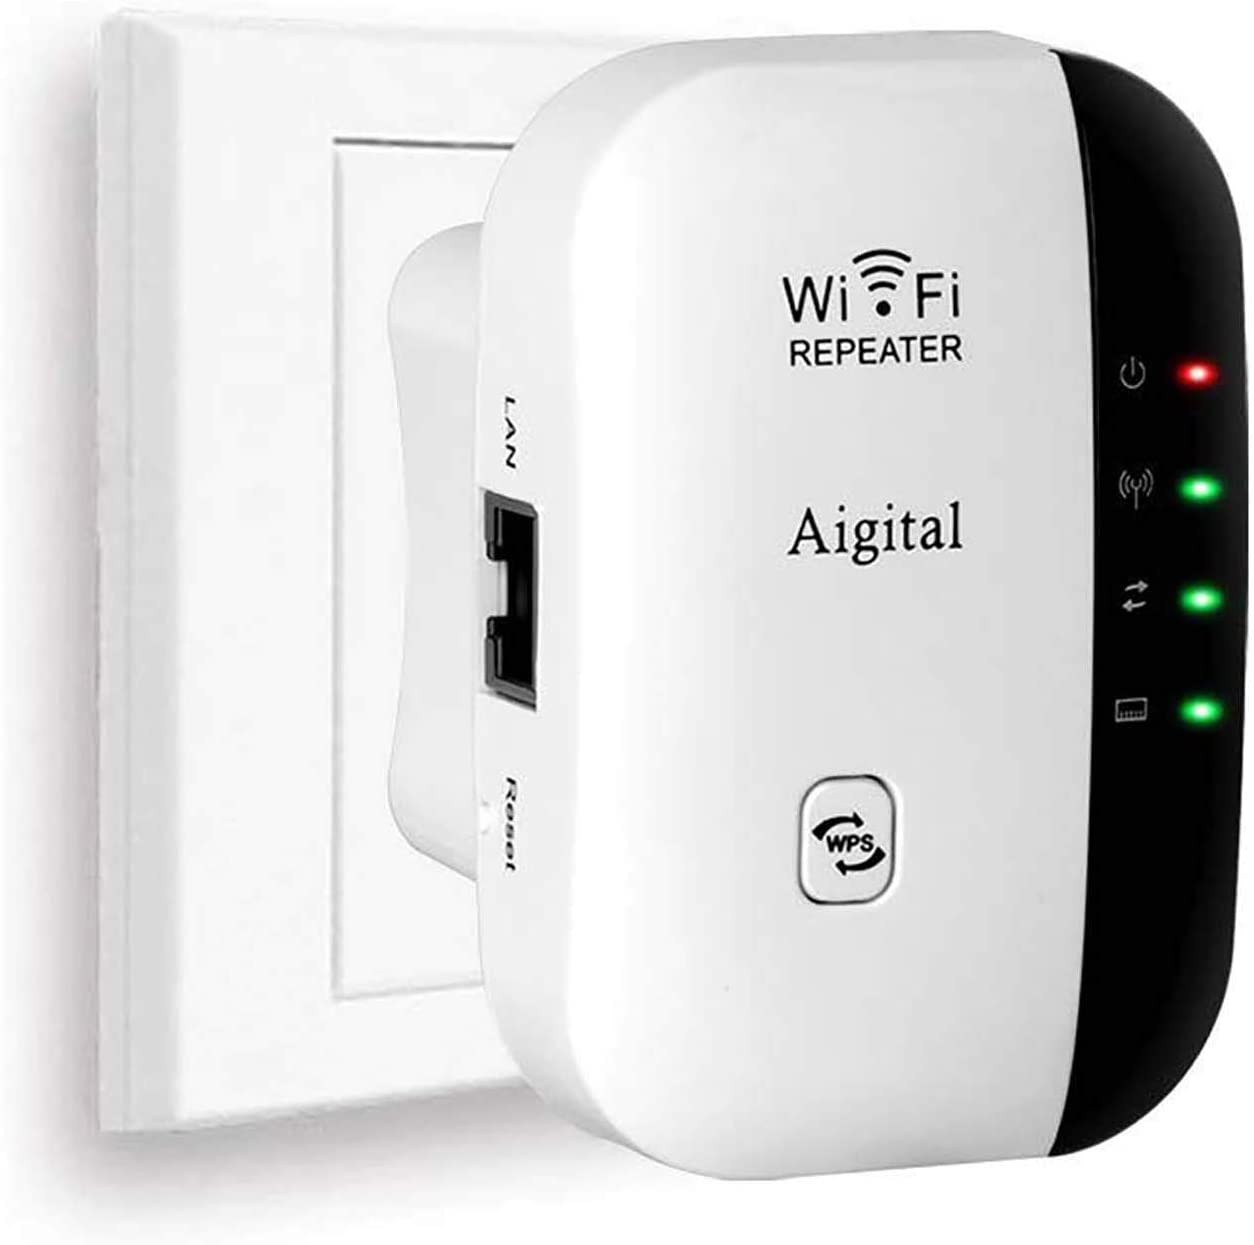 Aigital Extensor de Red WiFi, 300Mbps WiFi Repetidor WiFi Ap Amplificador Wireless Repeater Booster Wireless-N 2.4GHz Universal EU Enchufe (WPS)